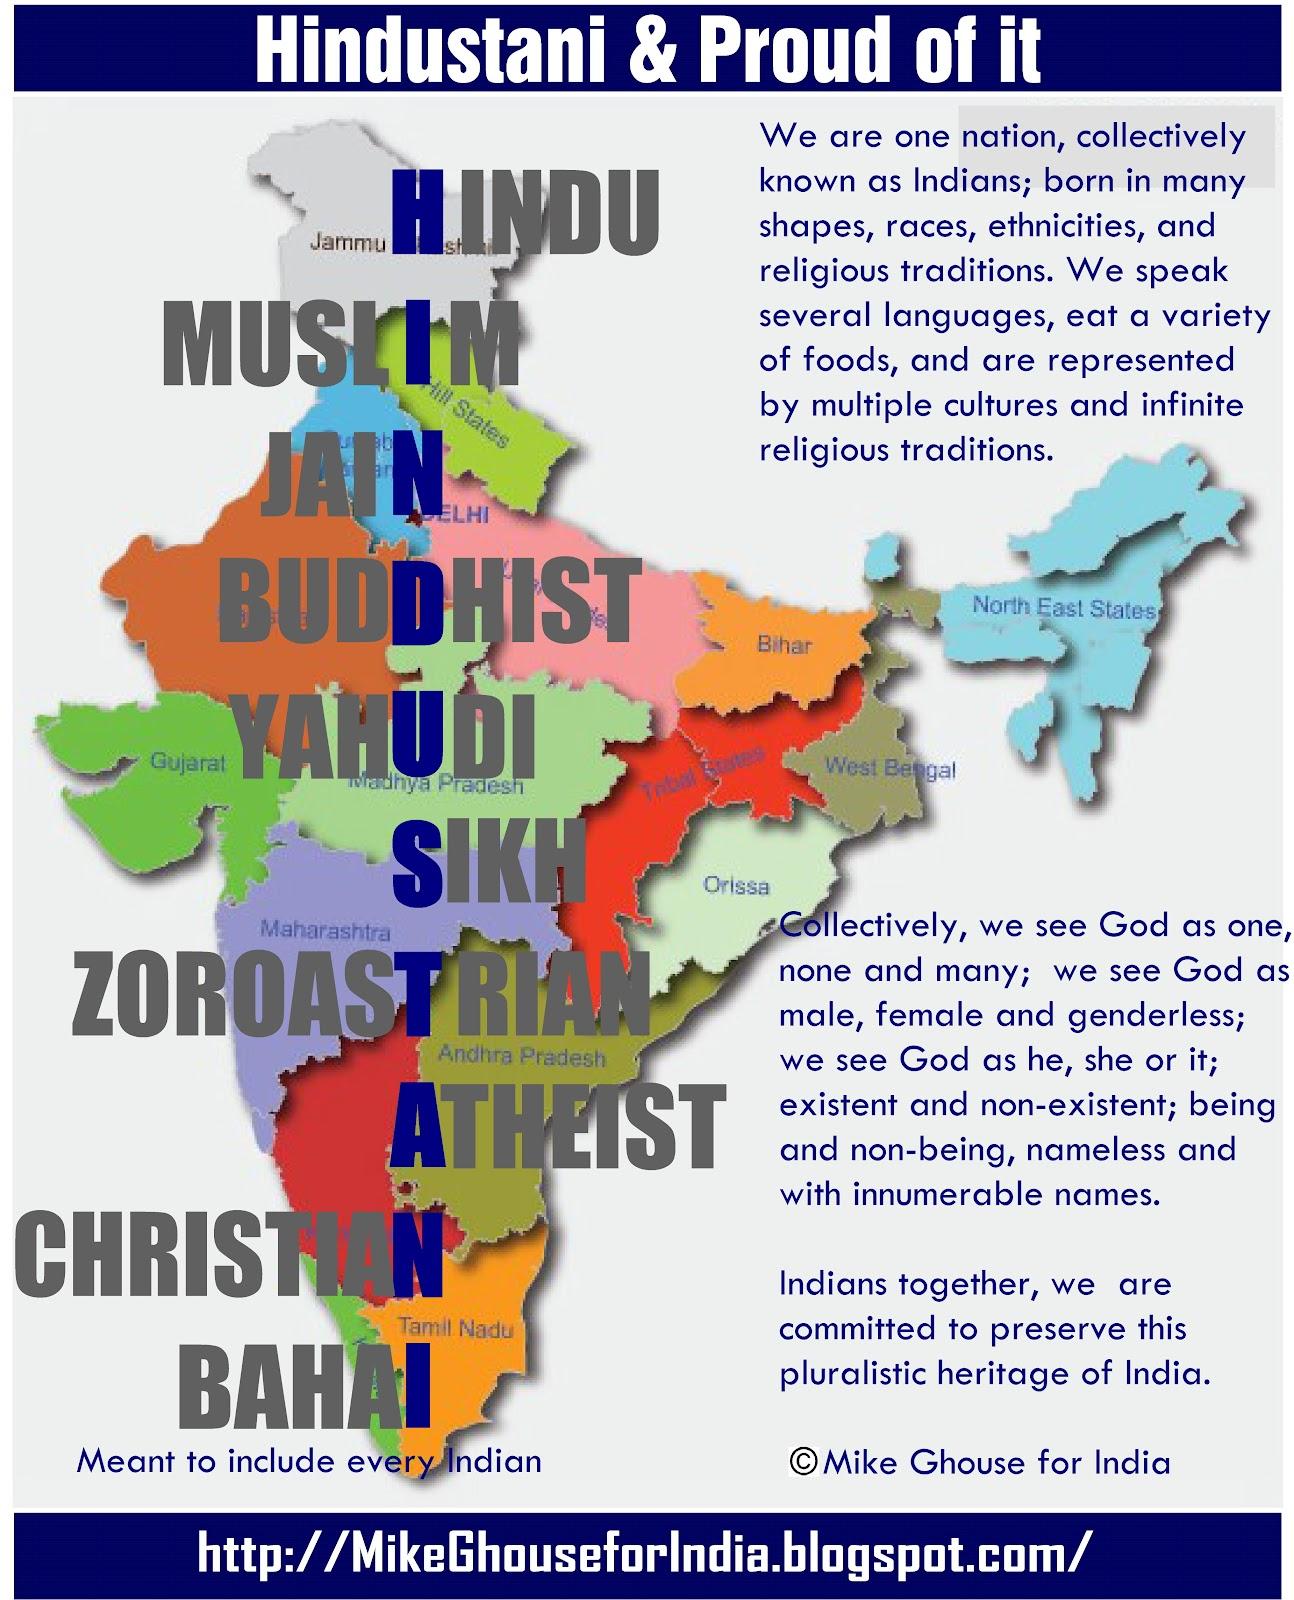 http://2.bp.blogspot.com/-o_1jhj1fH2o/T_c_WGpEuvI/AAAAAAAAQ7I/UQmKEaY5SgY/s1600/Hindustani.Indian.MikeGhouseforIndia2.jpg